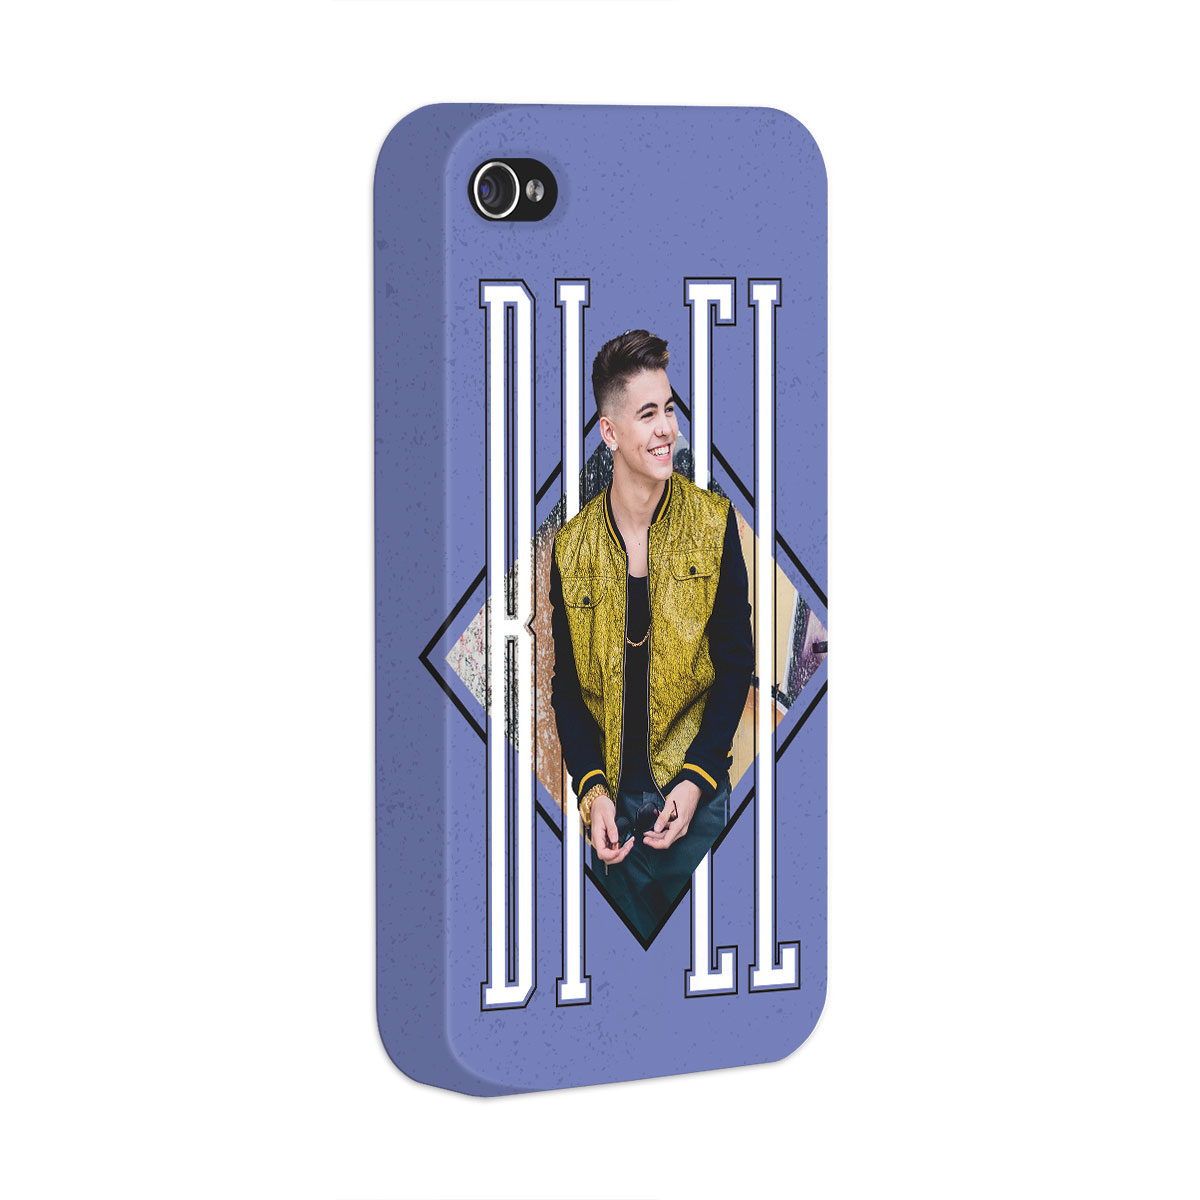 Capa para iPhone 4/4S Biel Type